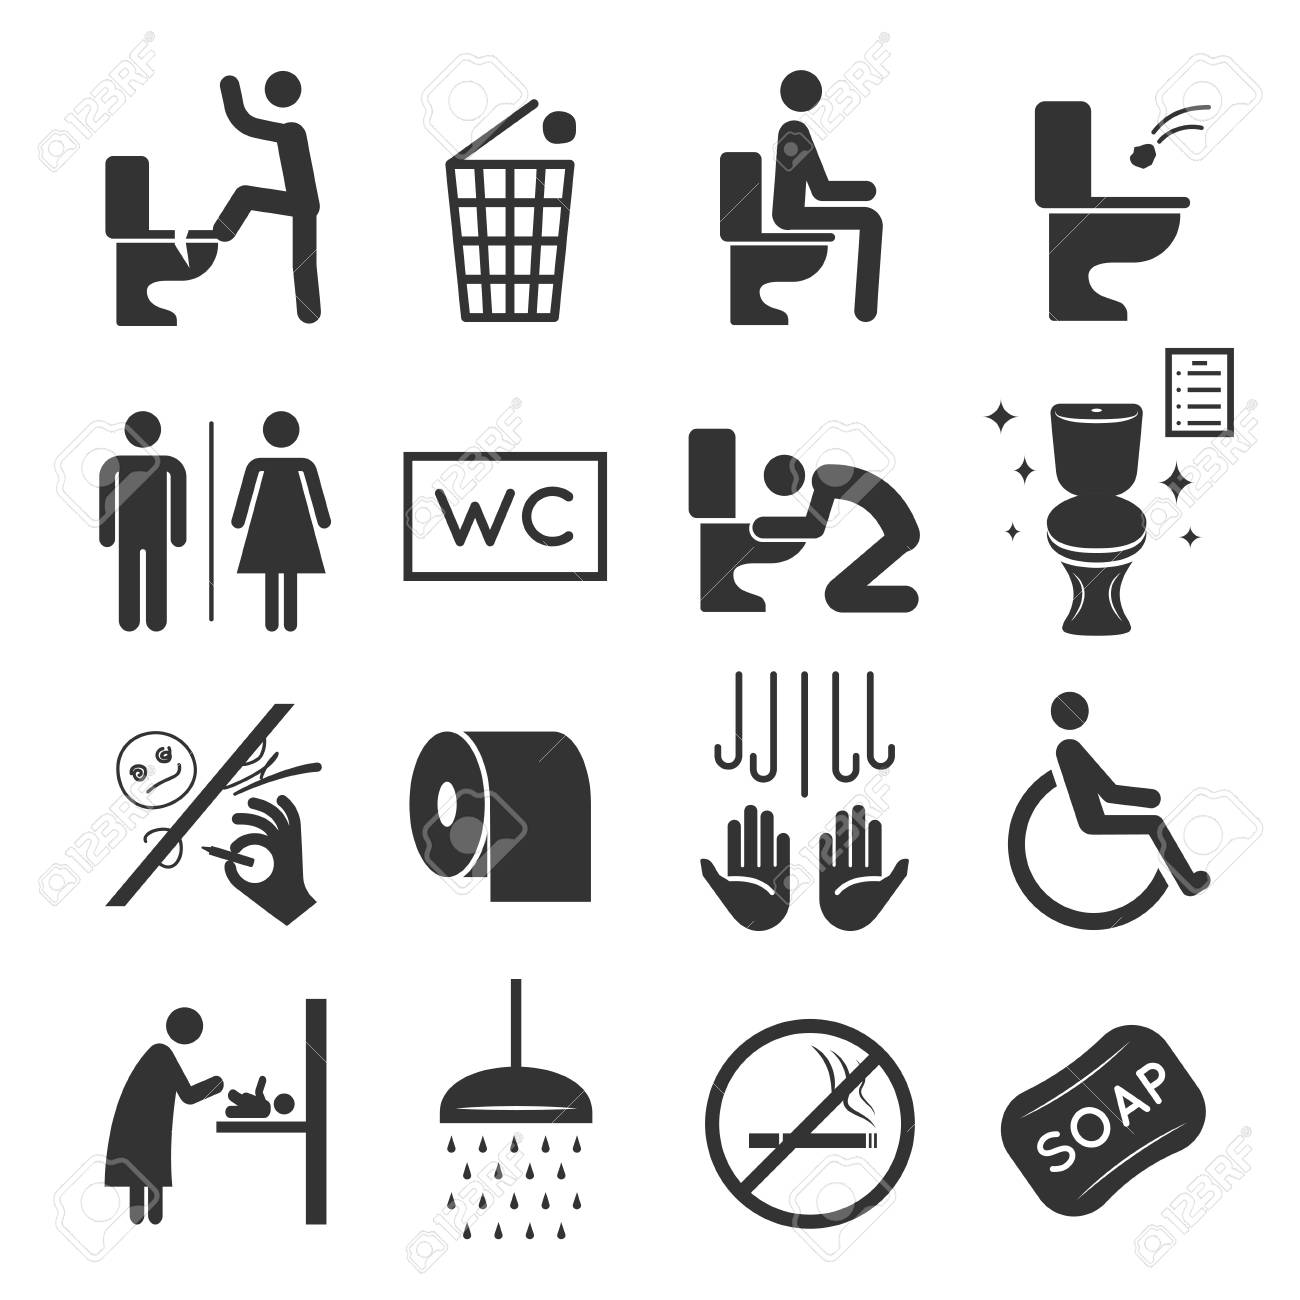 Restroom Icon Set Washroom And Bathroom Symbols Royalty Free Cliparts Vectors And Stock Illustration Image 111030547